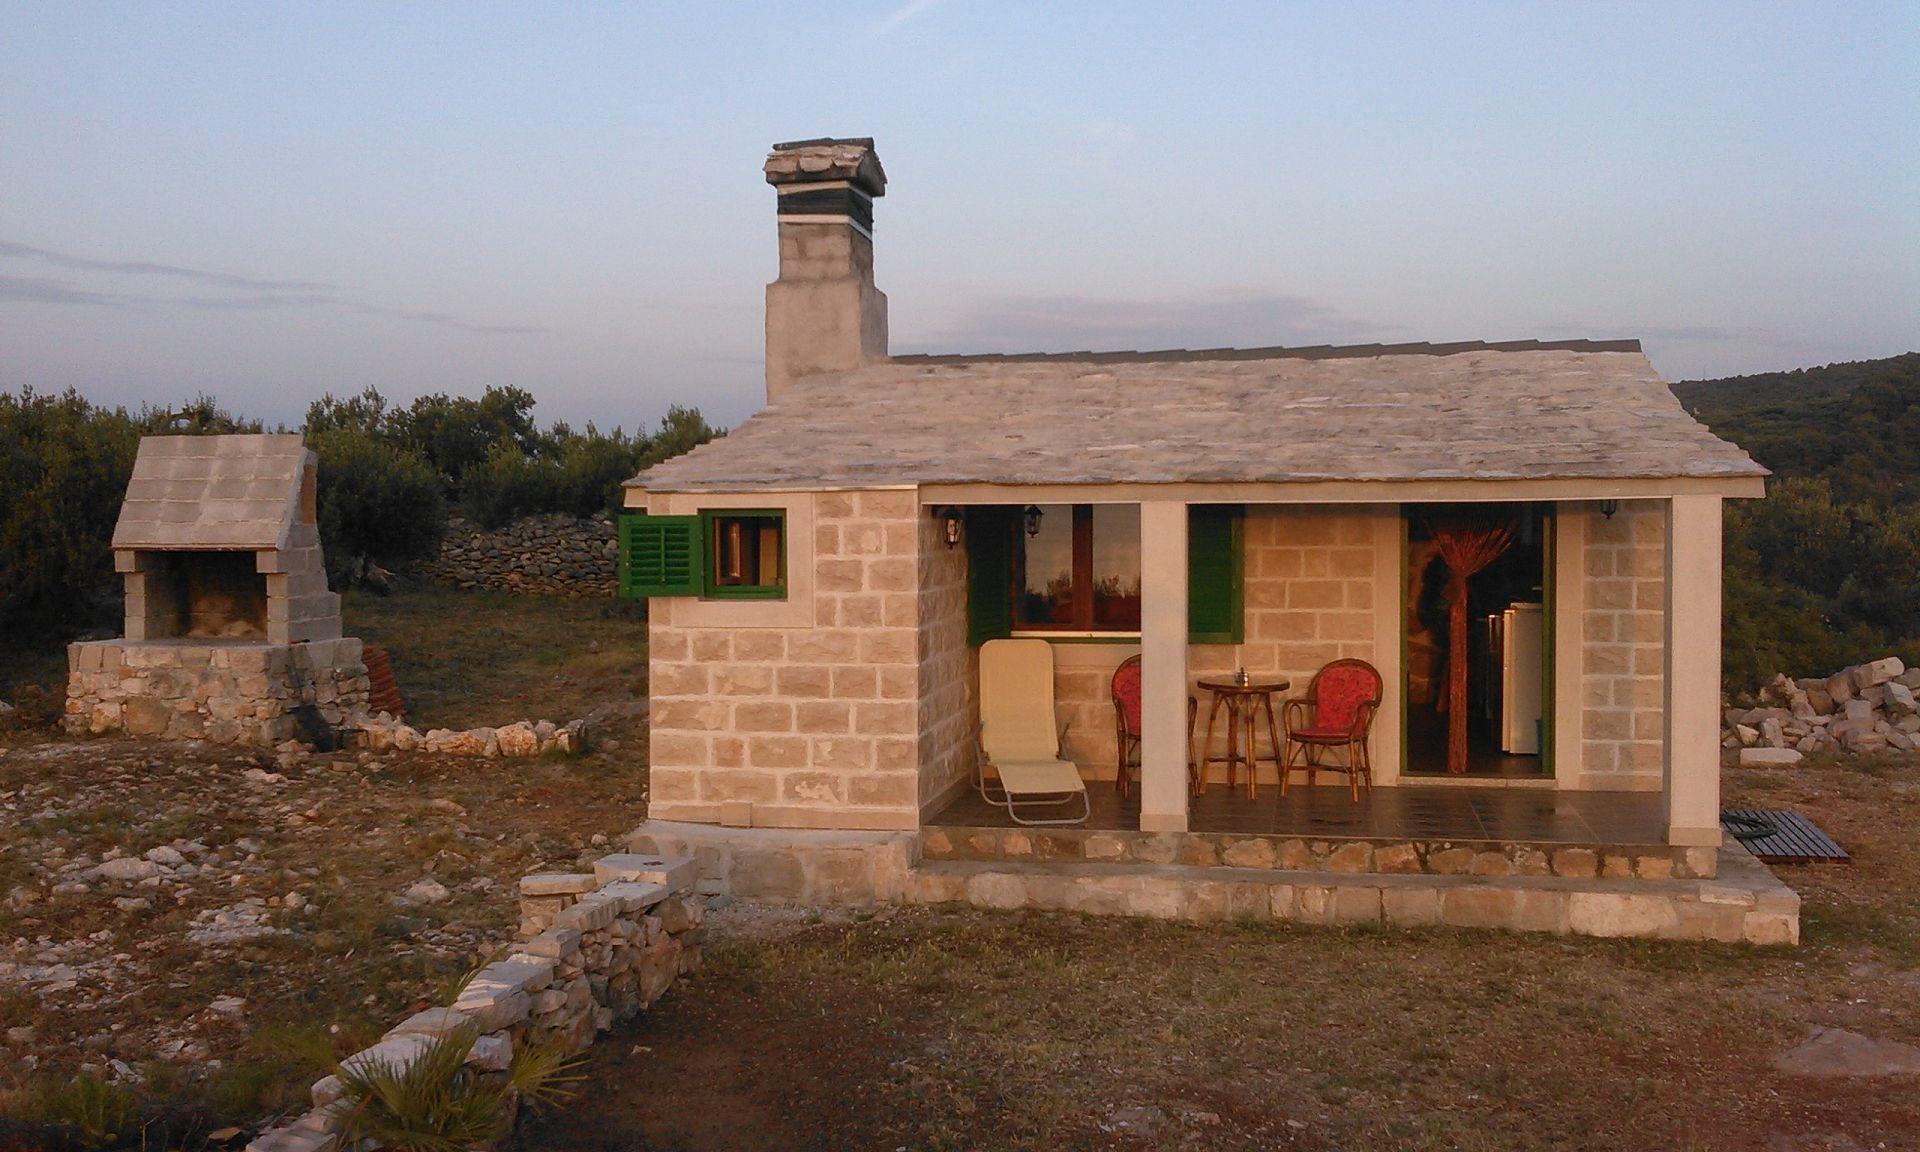 35384  - Splitska - Holiday houses, villas Croatia